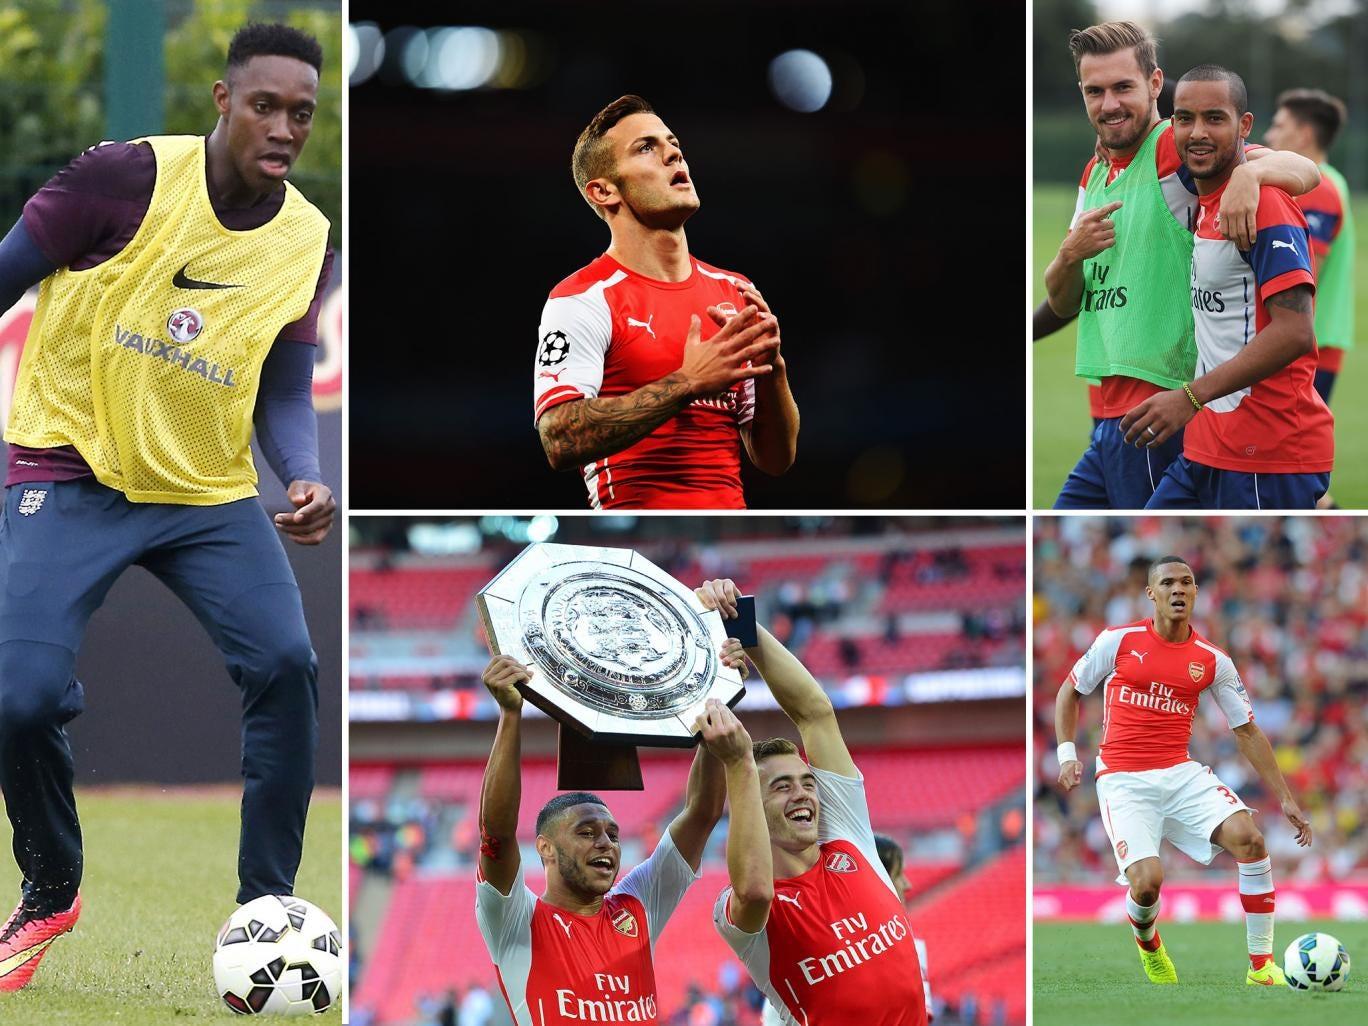 Arsenal stars Danny Welbeck, Jack Wilshere, Aaron Ramsey, Theo Walcott, Kieran Gibbs, Calum Chambers and Alex Oxlade-Chamberlain